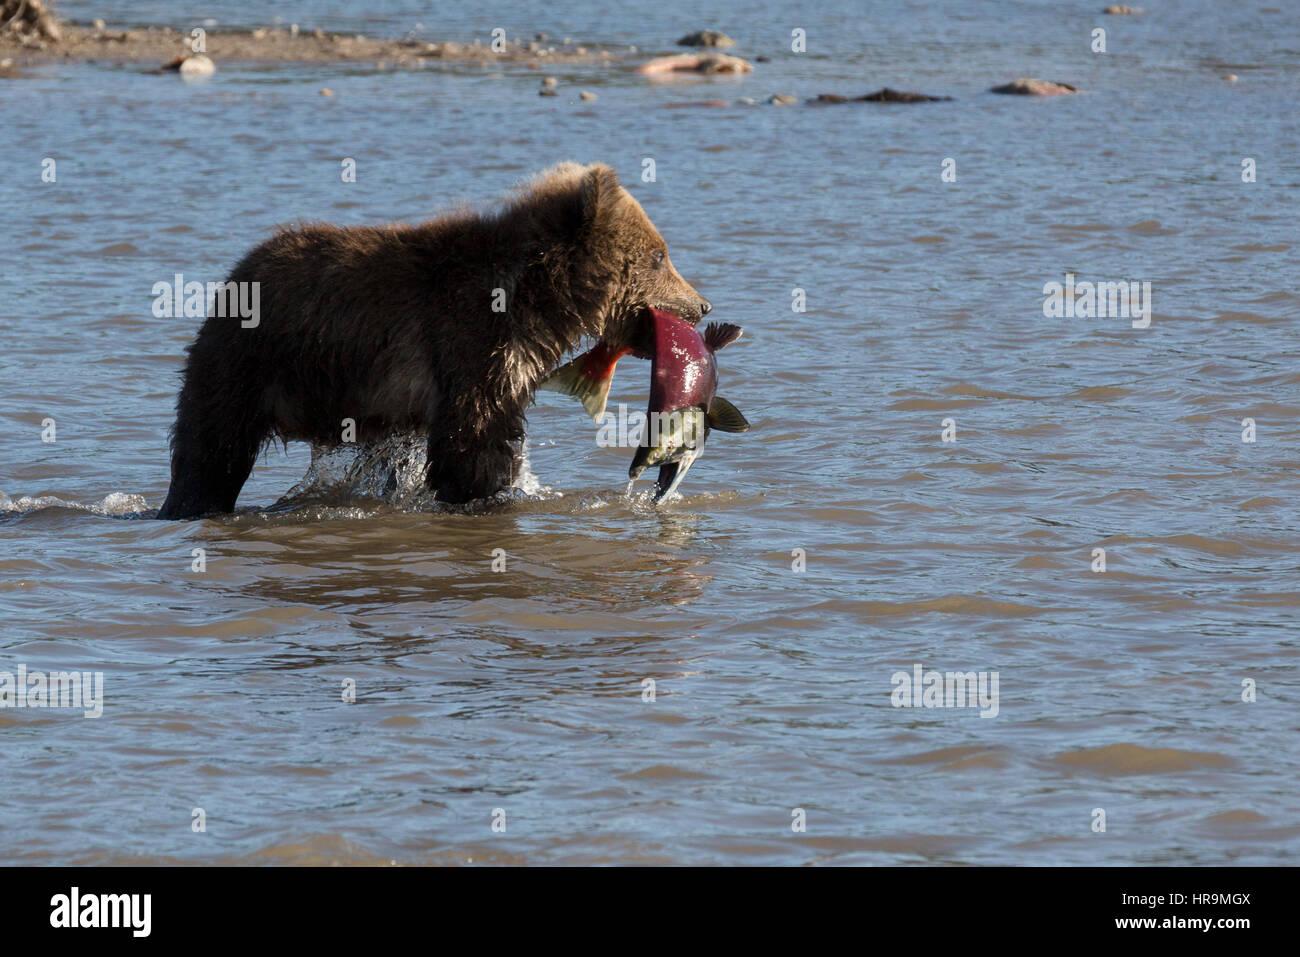 A wild brown bear eats fish in natural habitat - Stock Image